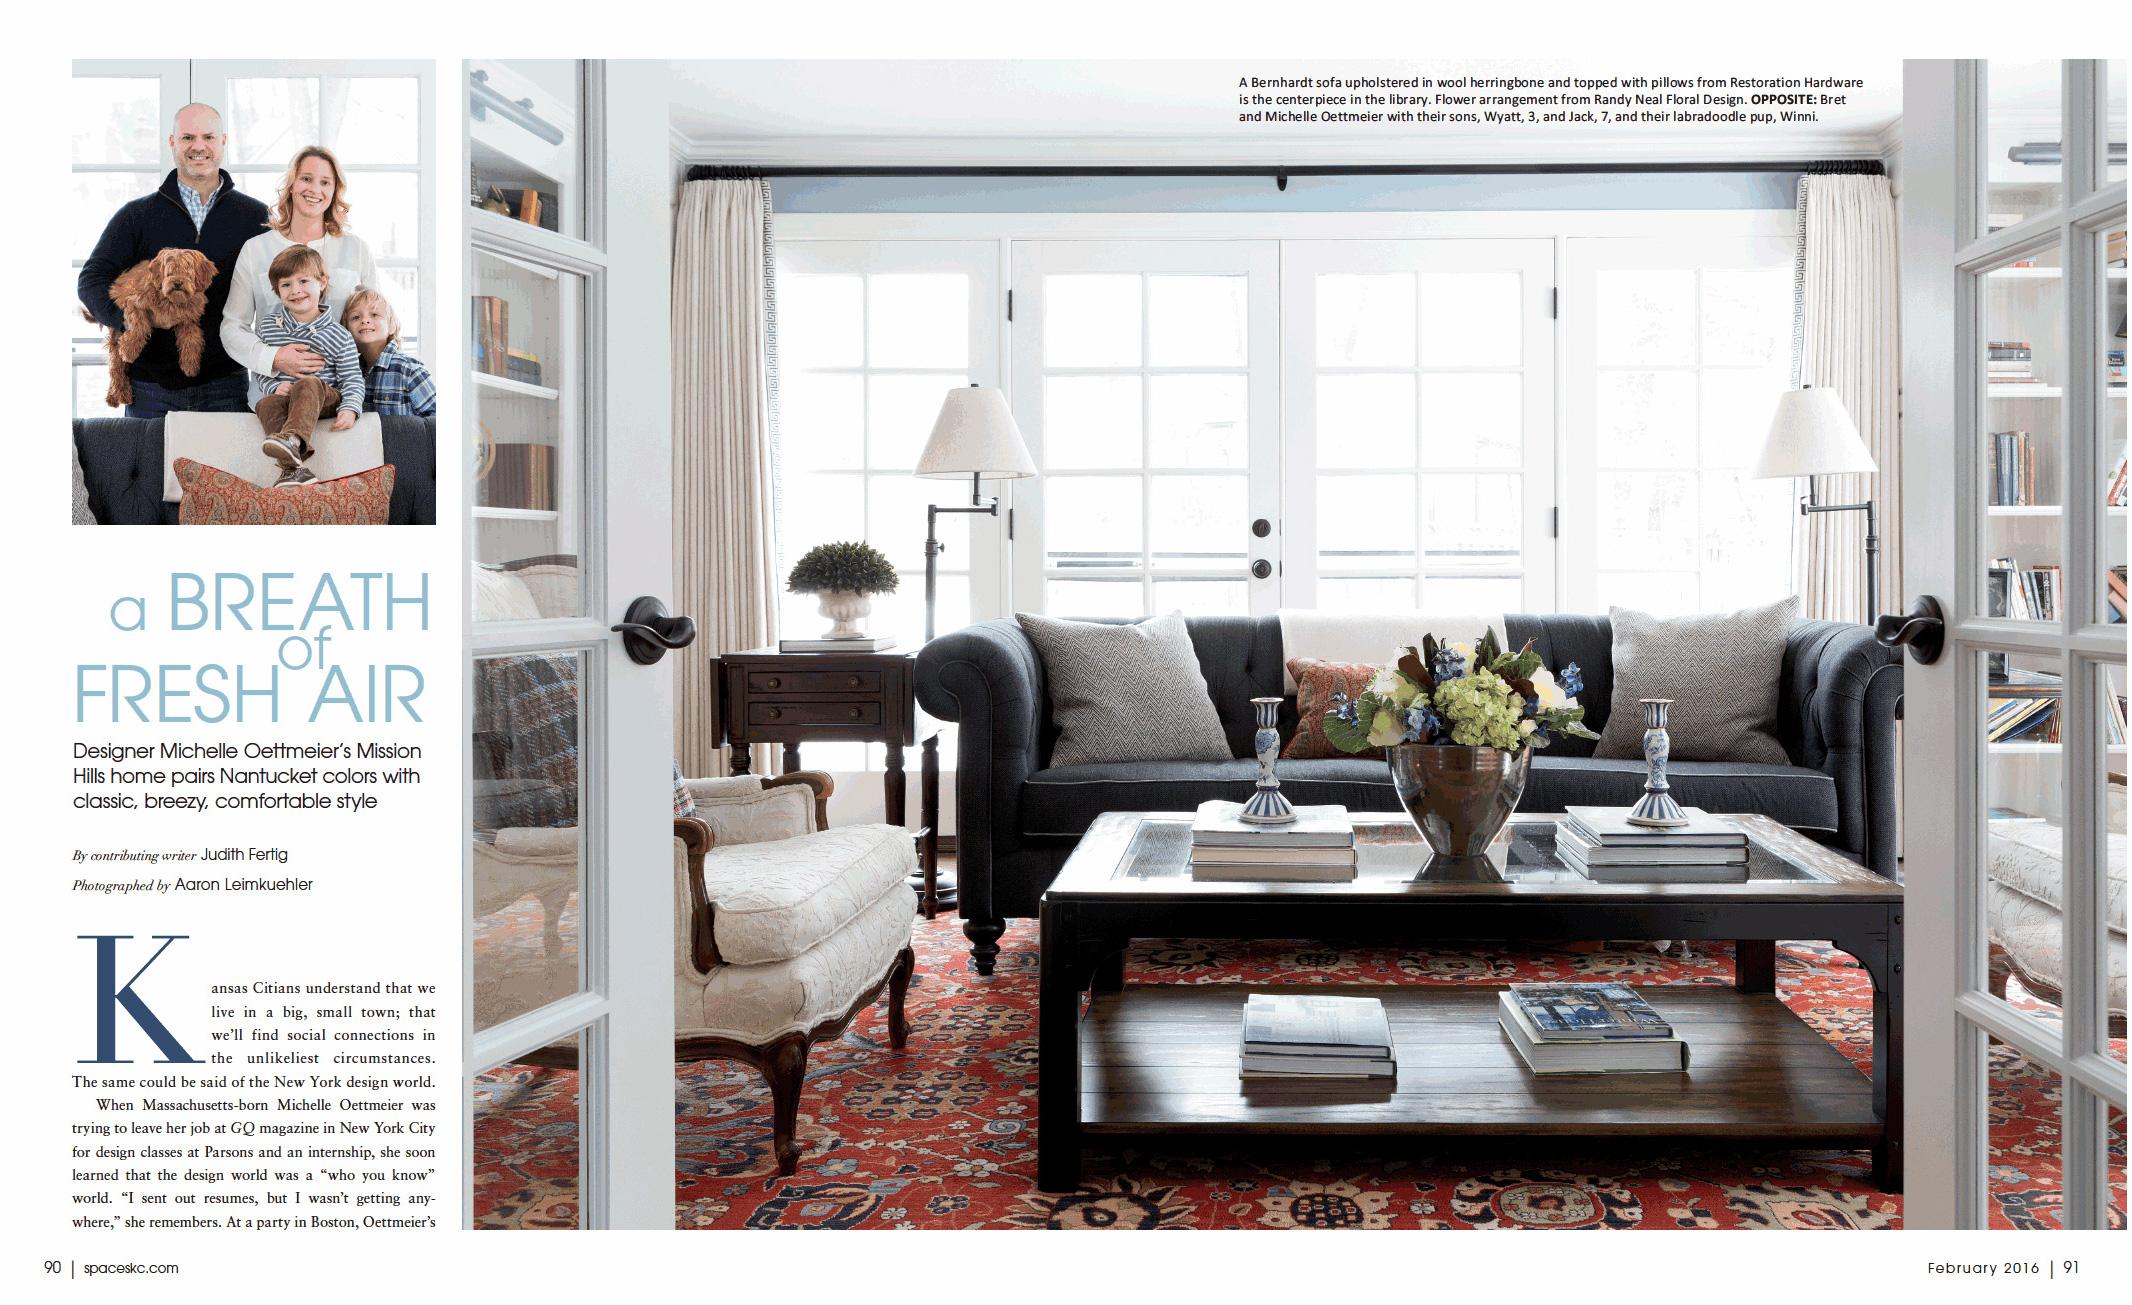 Michelle-Oettmeier-Spaces.jpg